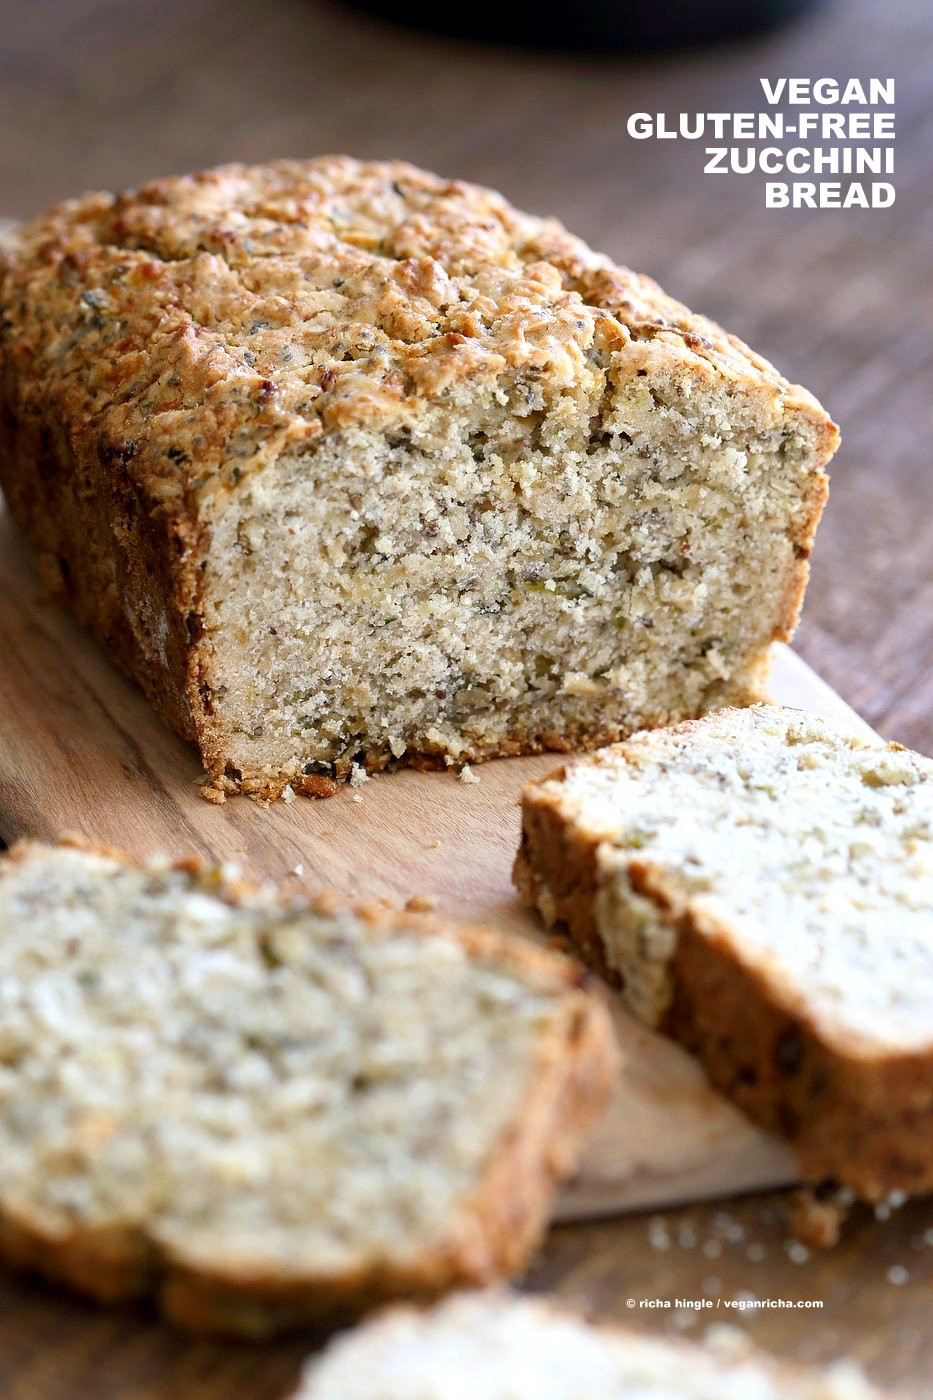 Gluten Free Vegan Recipes  Vegan Gluten free Zucchini Bread Recipe Vegan Richa